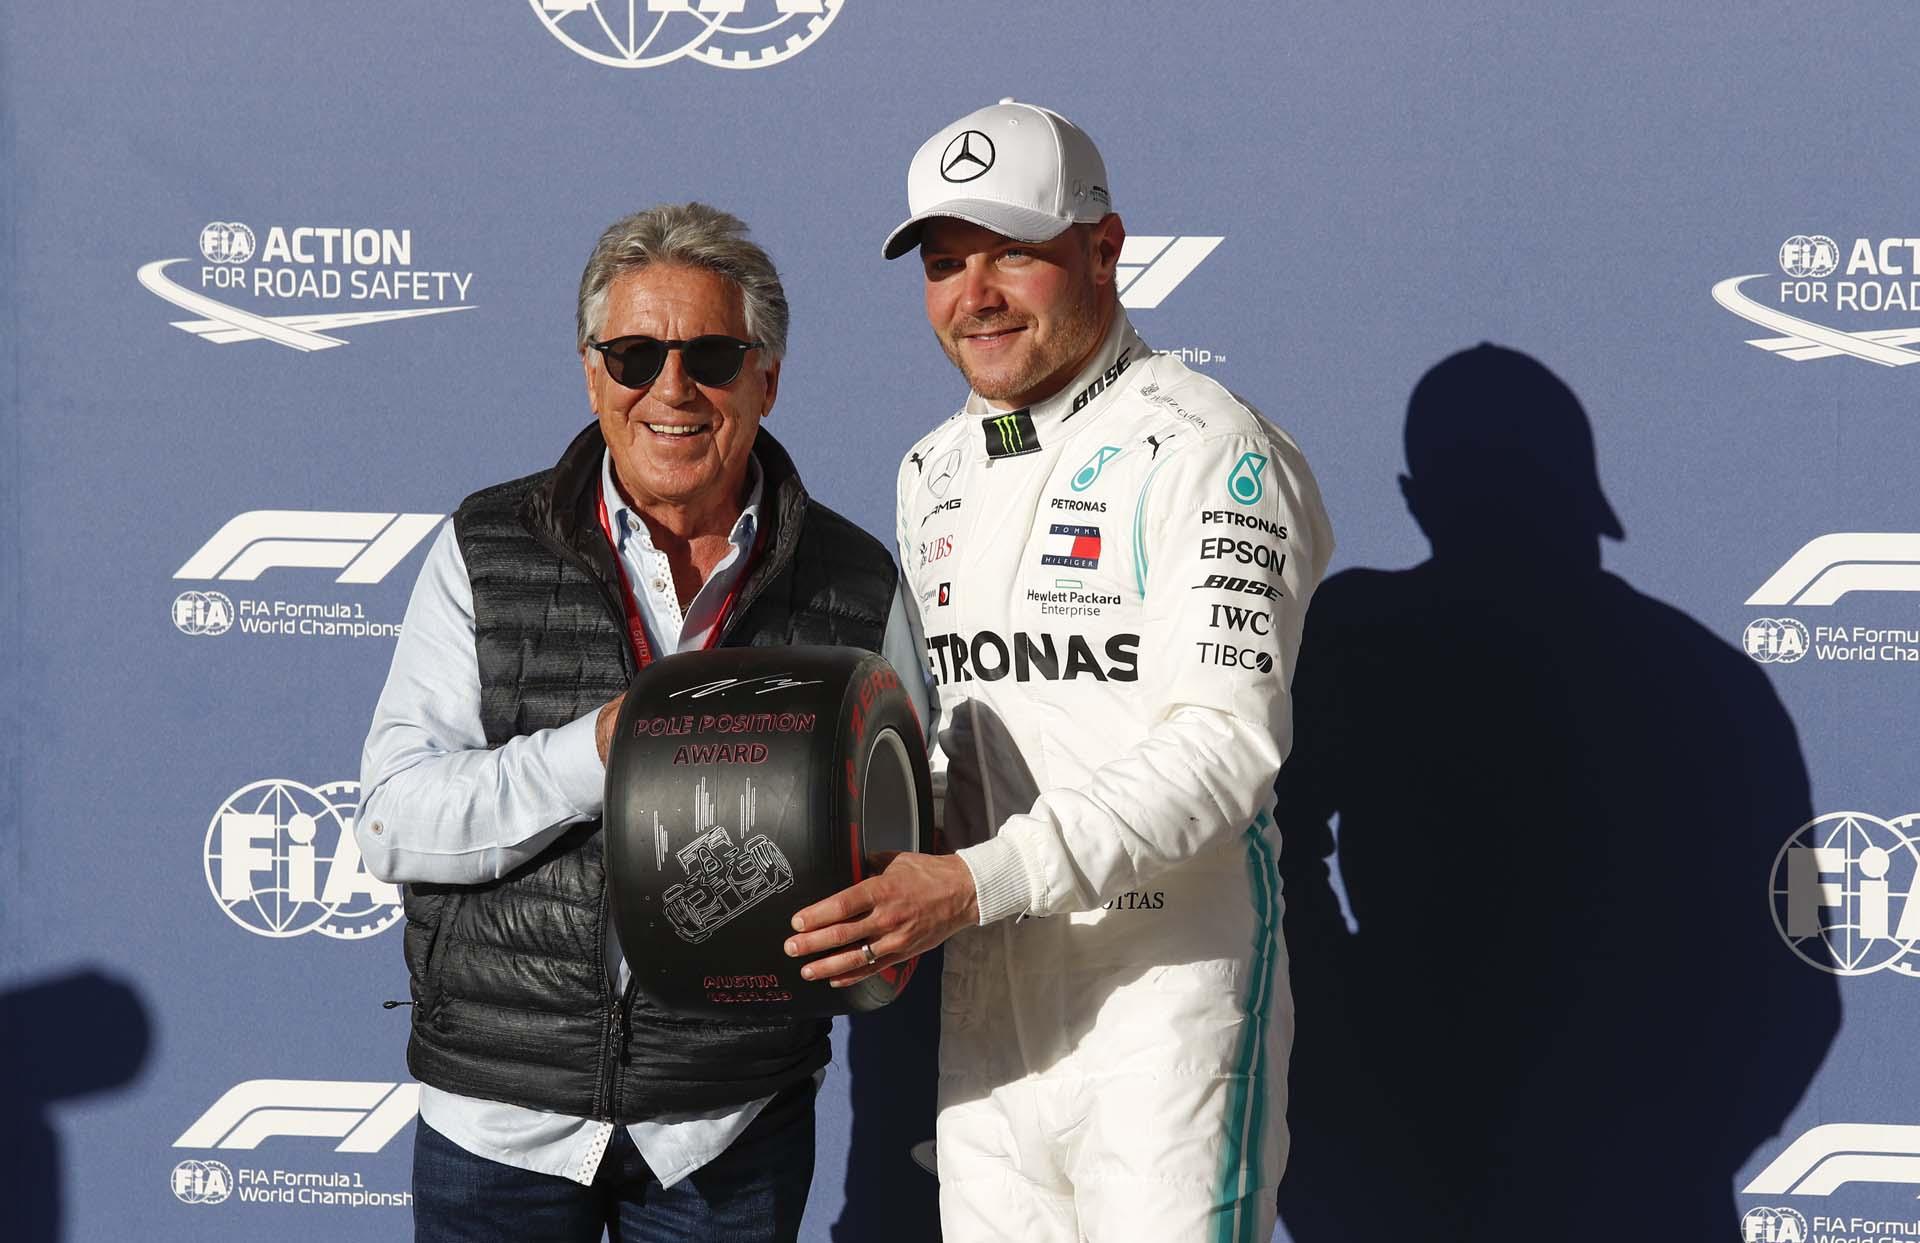 2019 United States Grand Prix, Saturday - Wolfgang Wilhelm